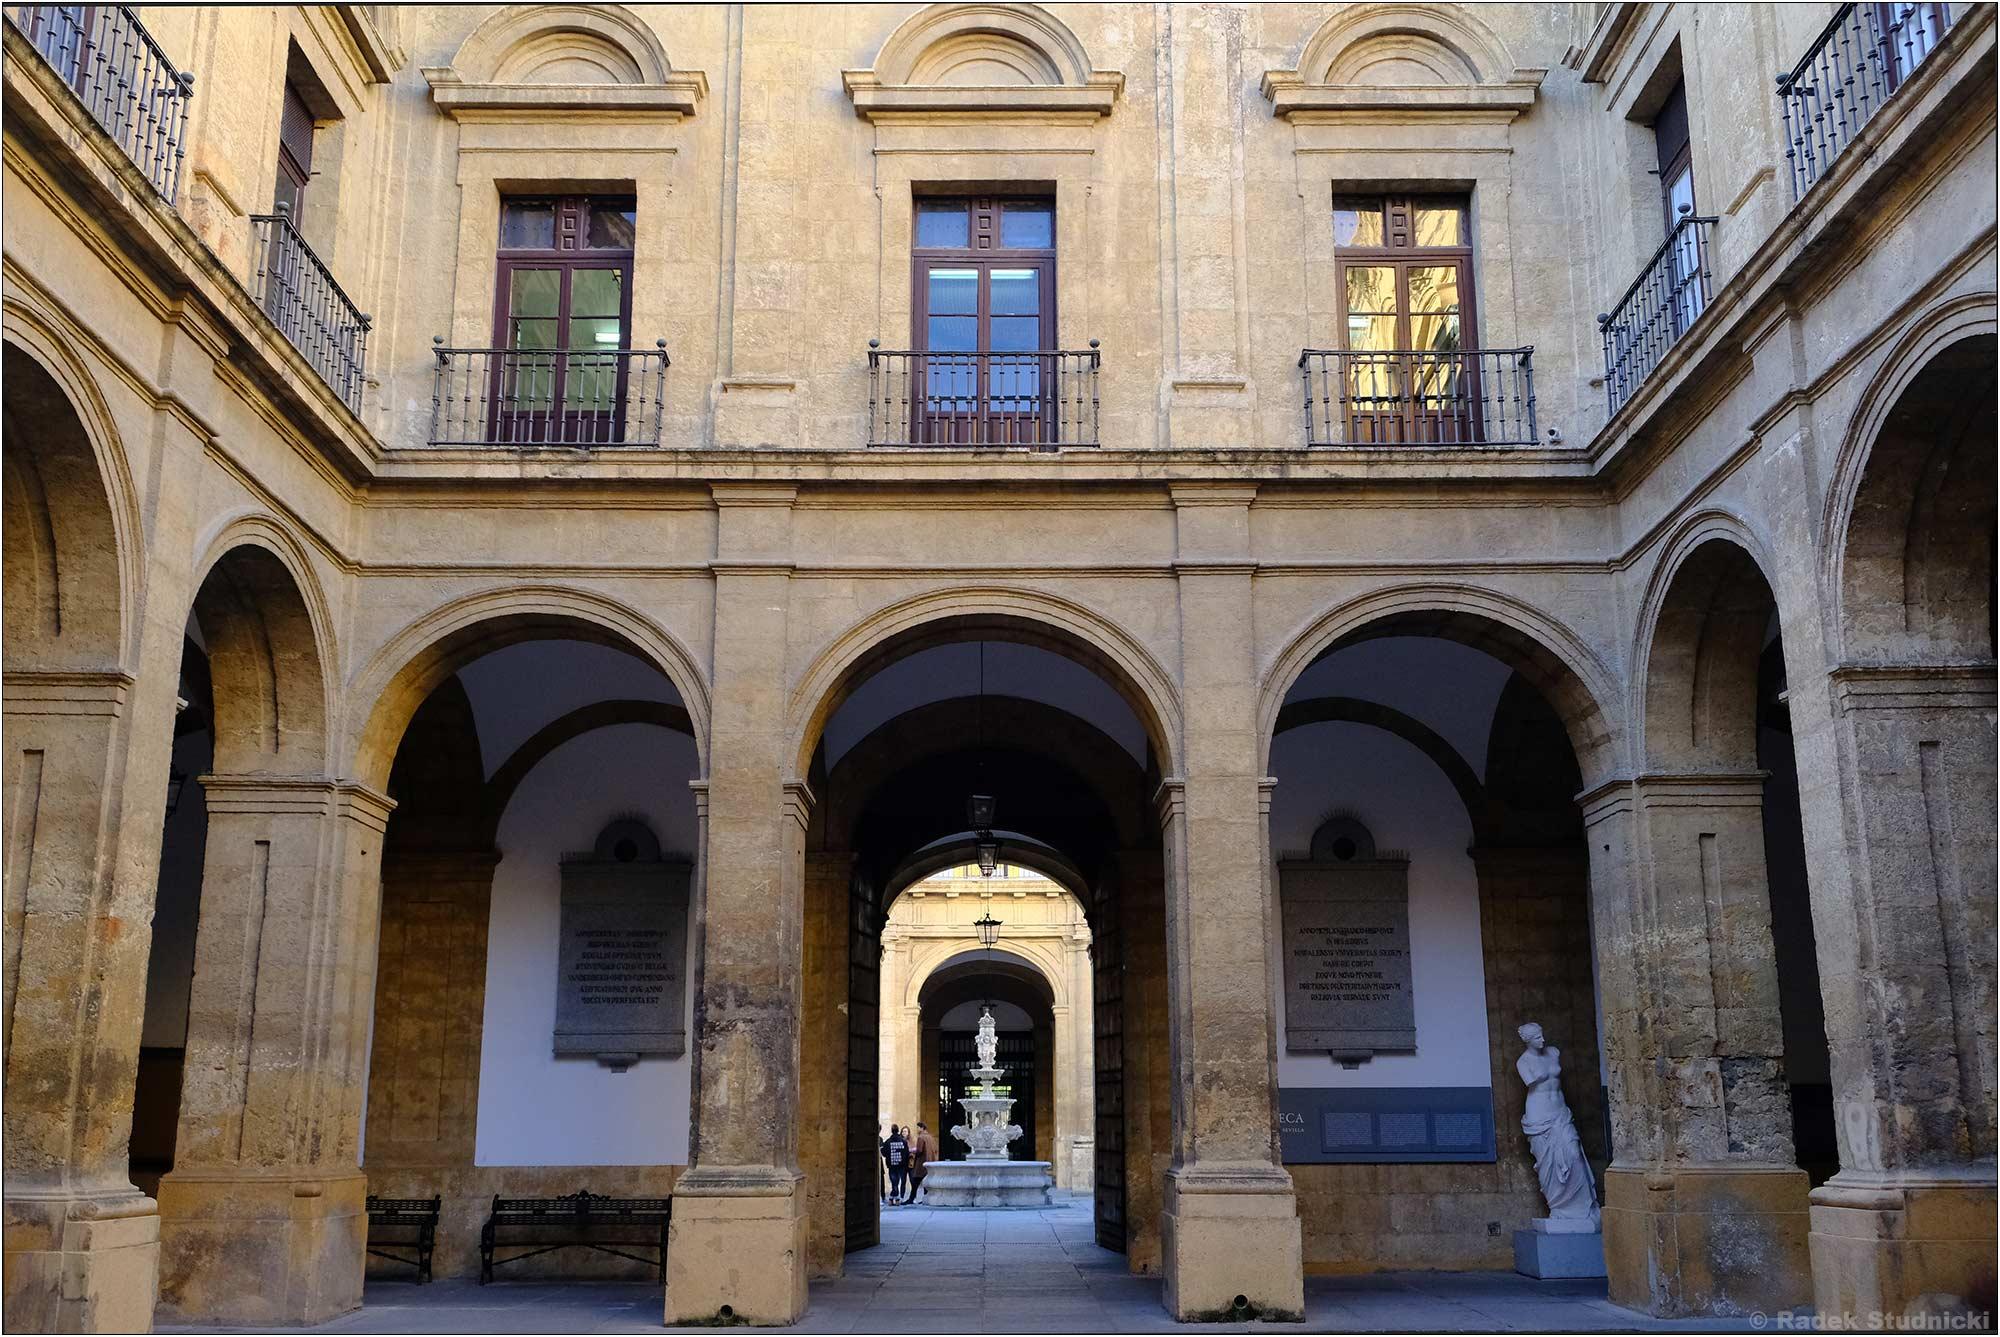 Uniwersytet w Sewilli